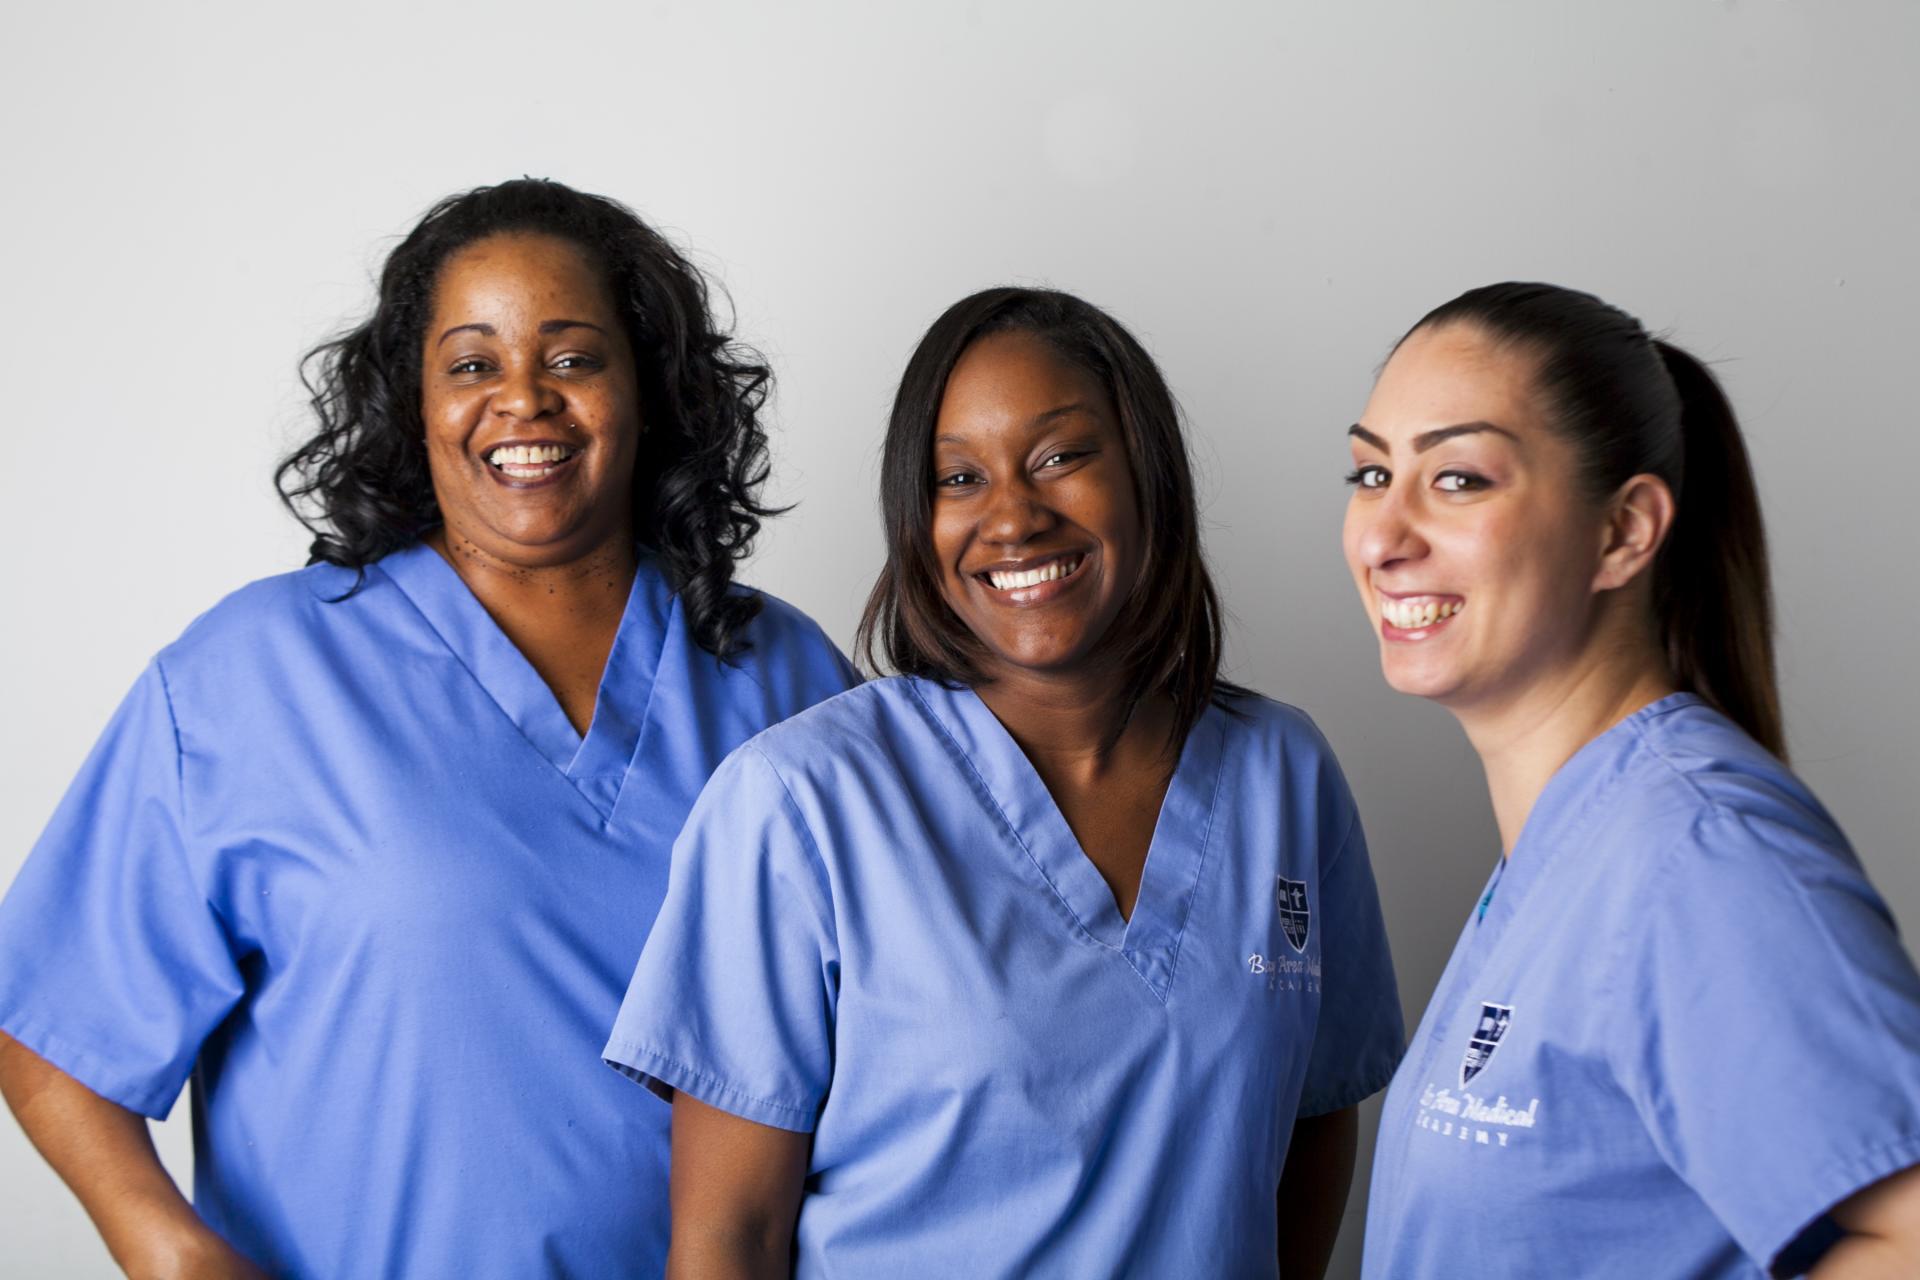 Bay Area Medical Academy – Healthcare Career Training Regarding San Jose State Academic Calendar